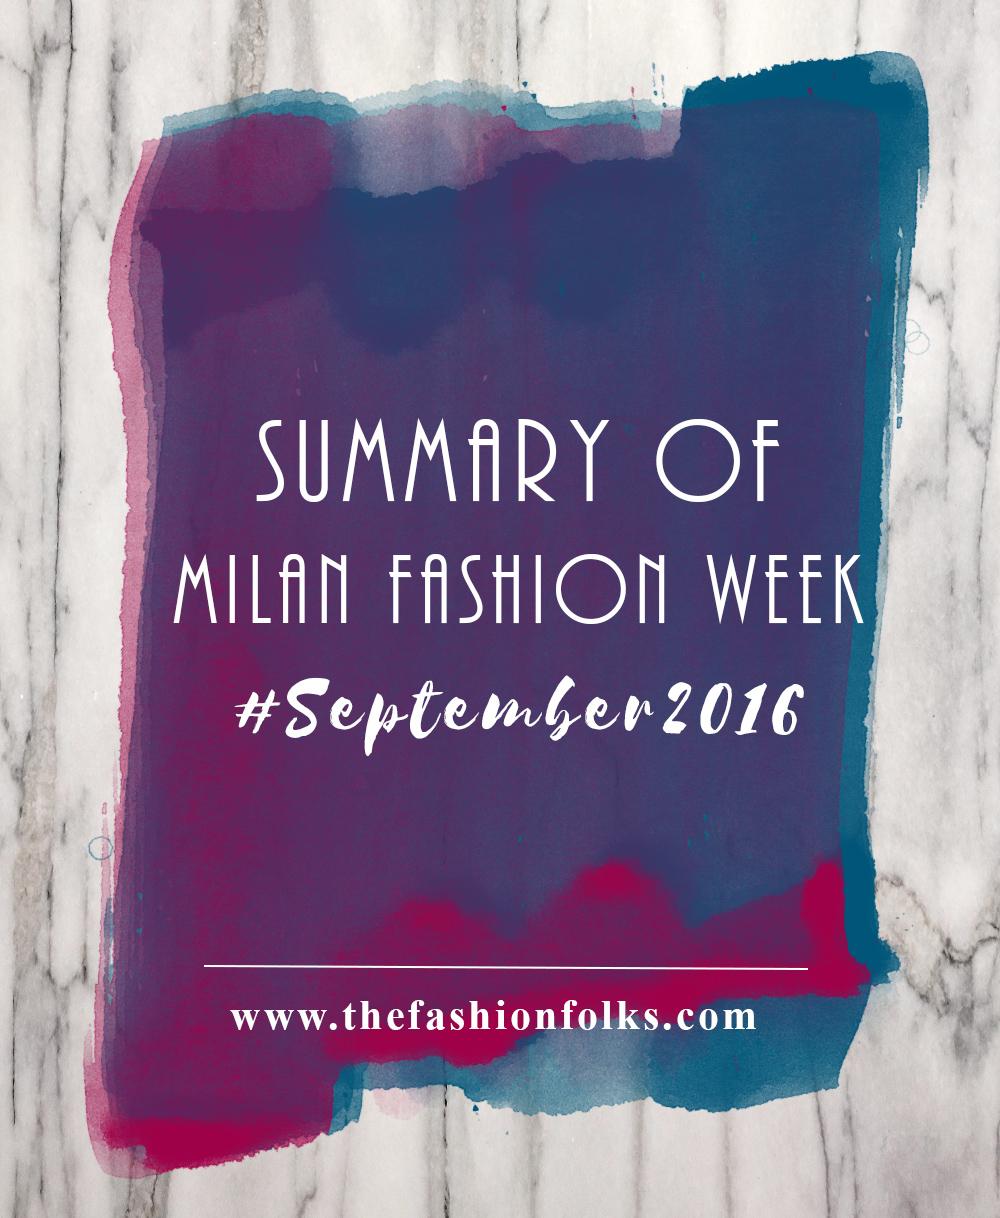 Summary Of Milan Fashion Week September 2016 | The Fashion Folks